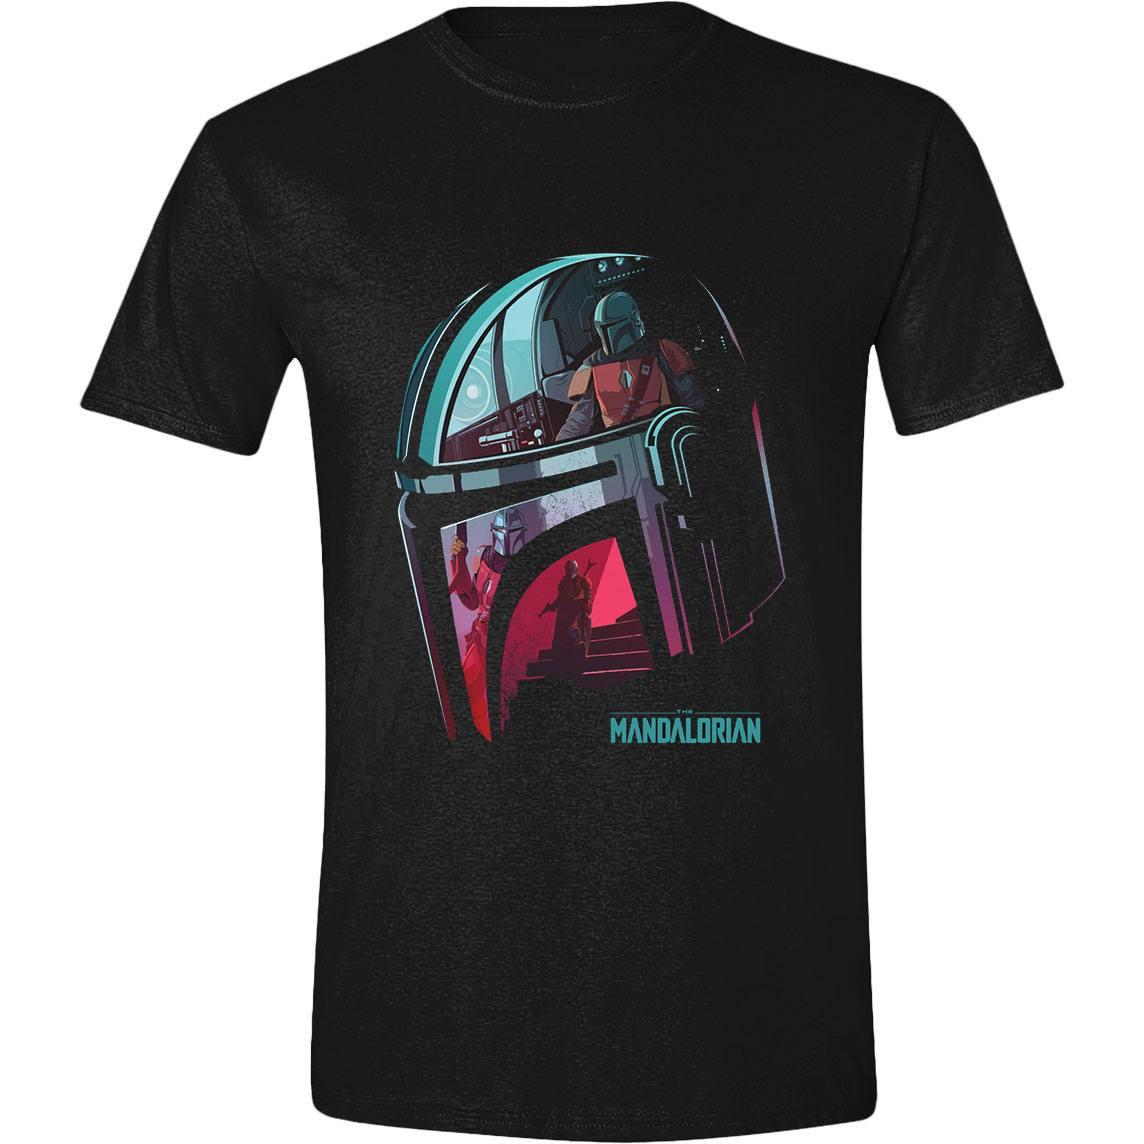 Star Wars The Mandalorian T-Shirt Reflection Size L